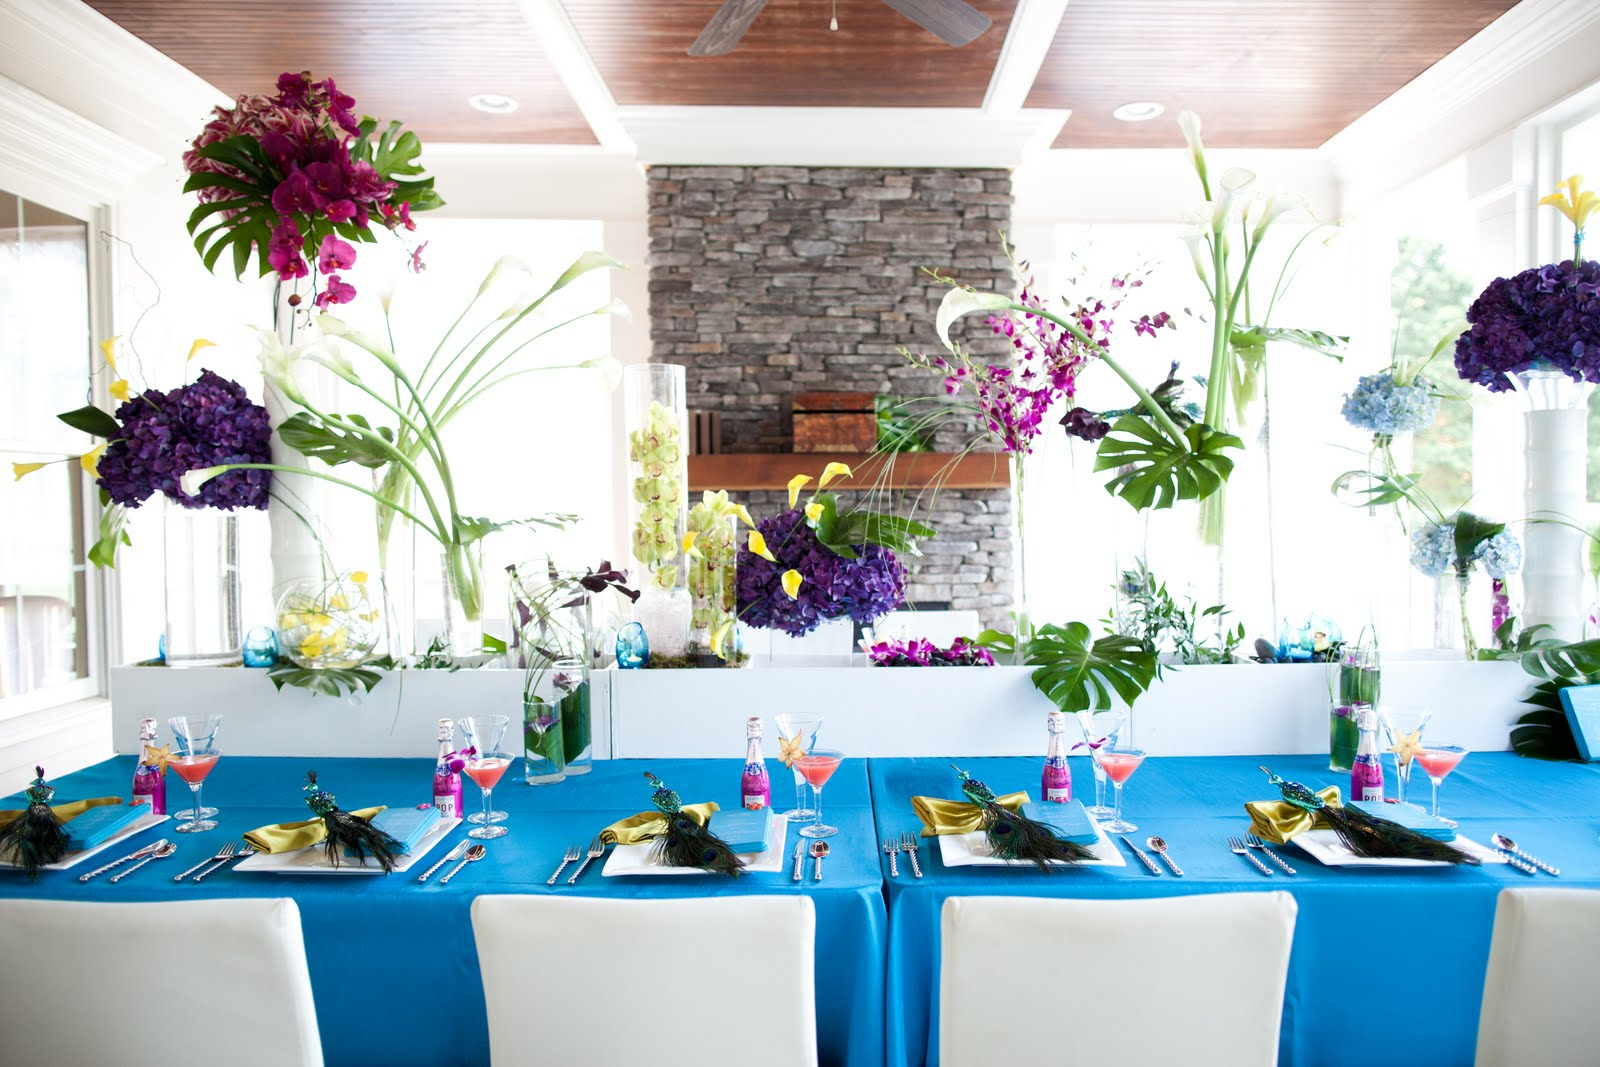 Hilton Caribbean Weddings: Caribbean Comfort {Wedding Inspiration}